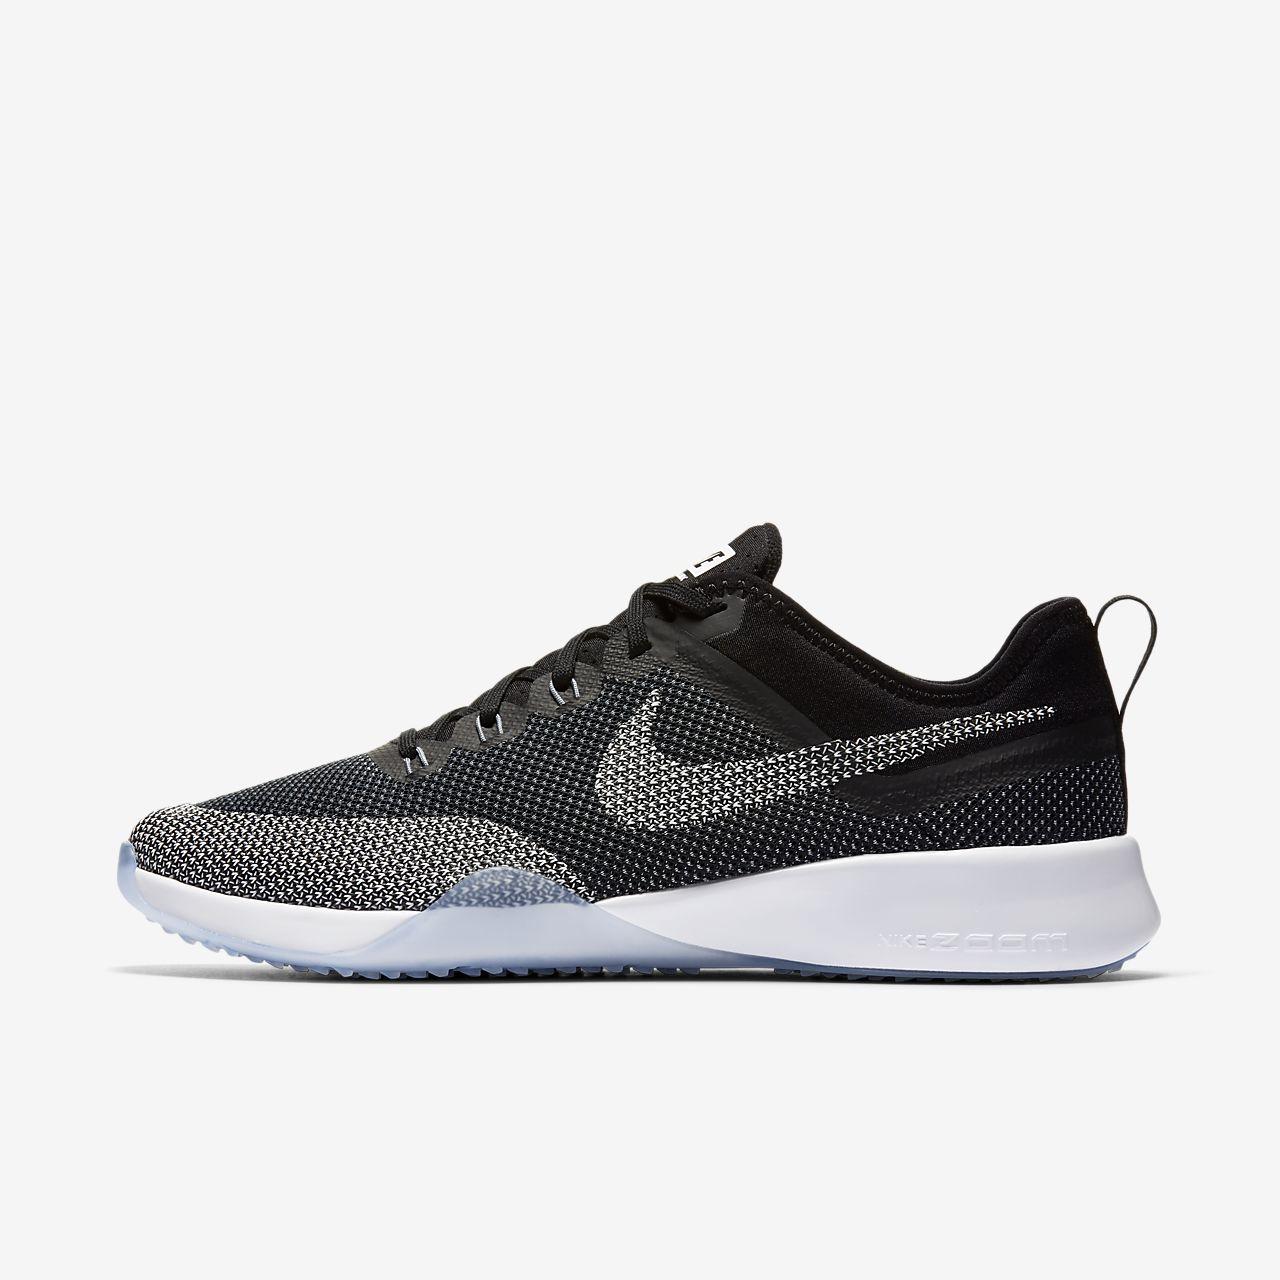 Tr Femme Nike Be Dynamic Chaussure Zoom De Training Air Pour x8YEqv7wE